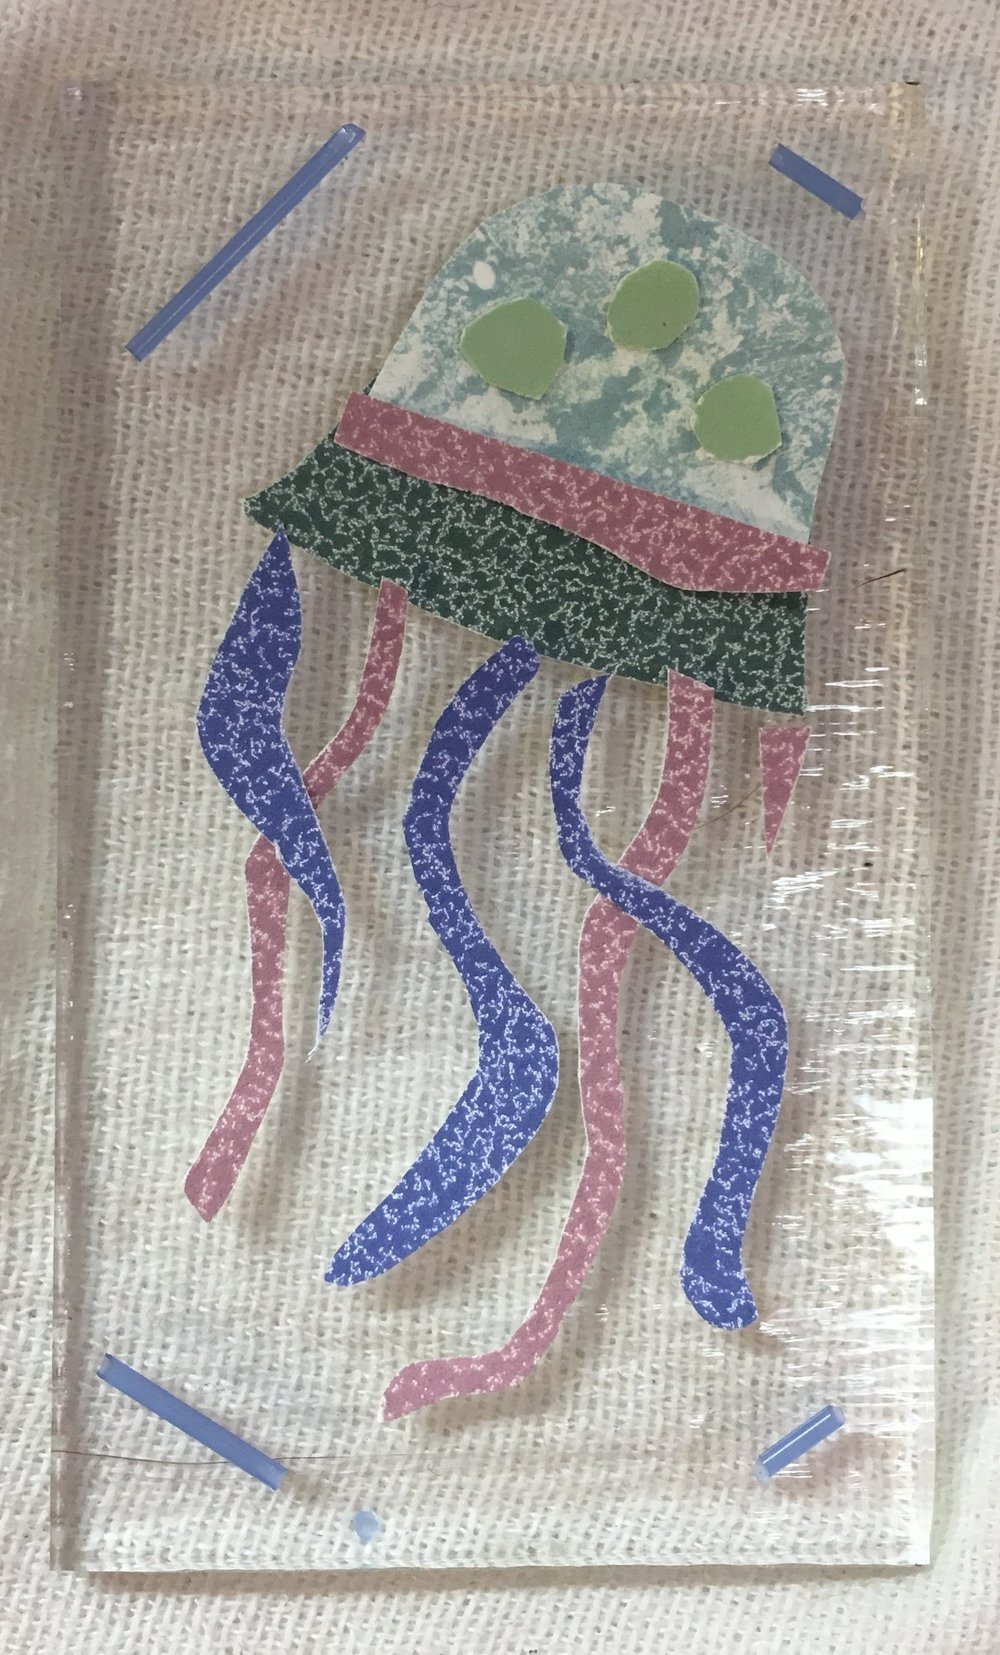 glassline_paper_jellyfish_pre-fuse.jpg